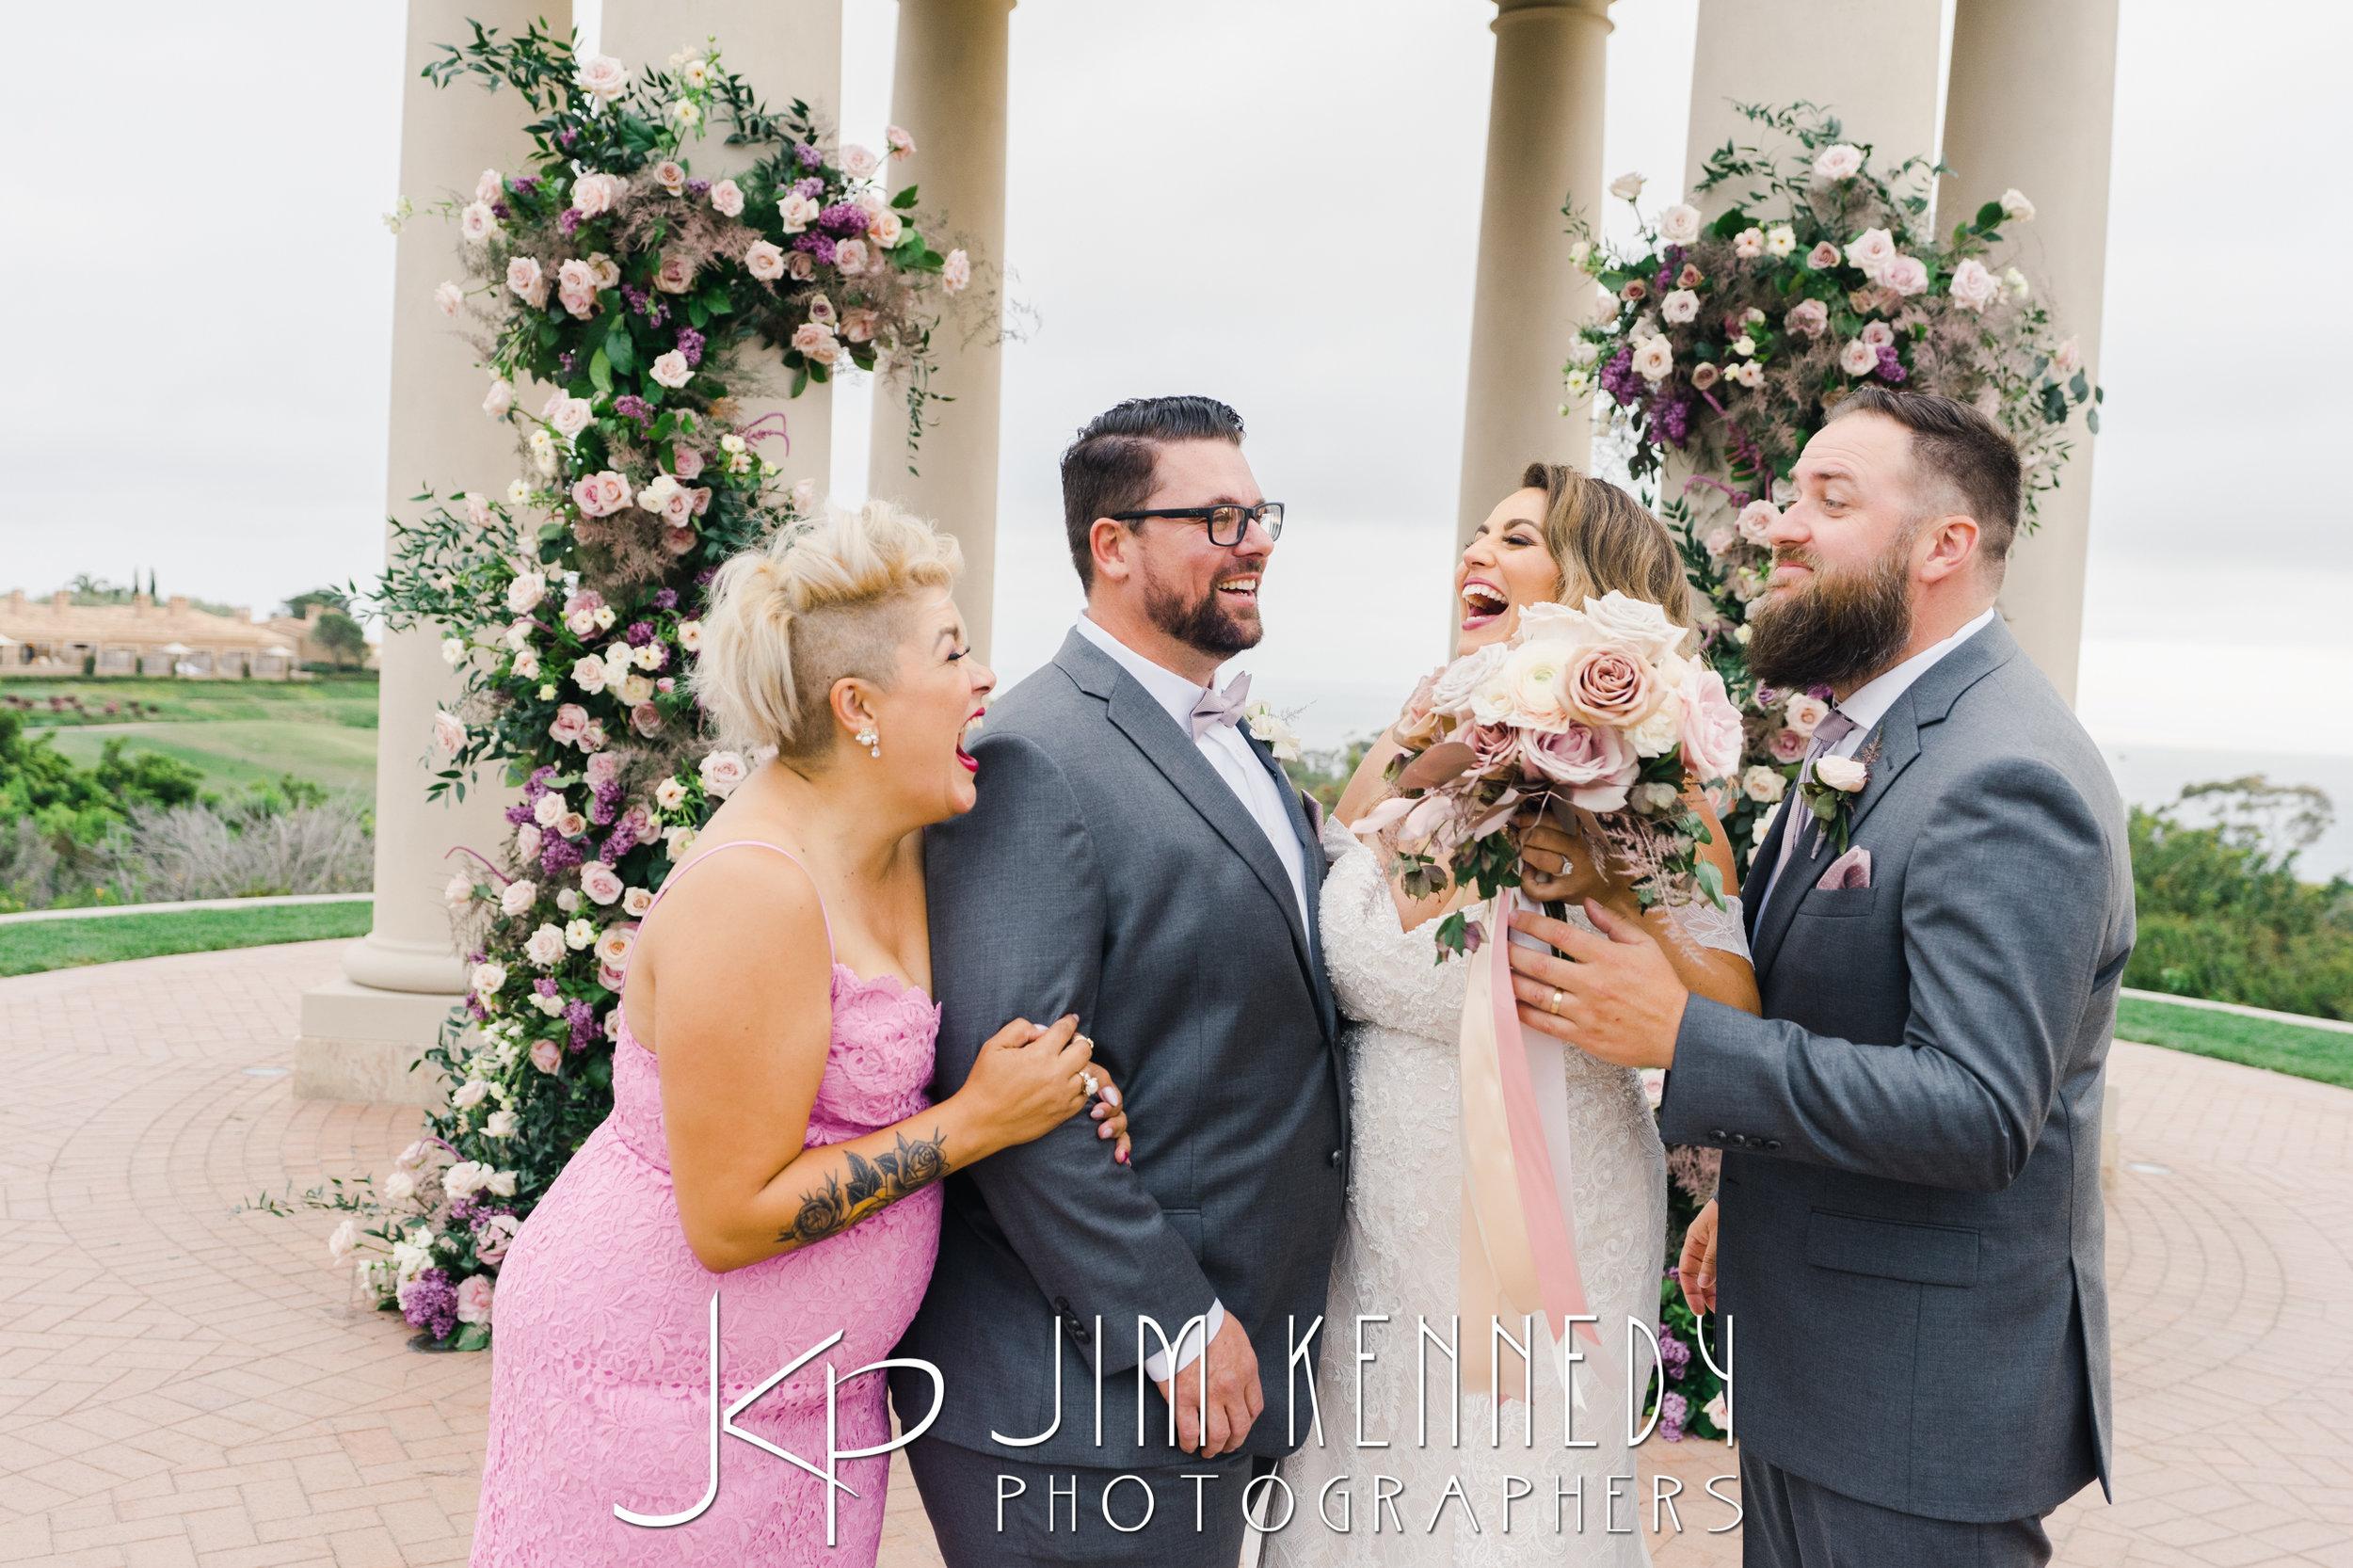 pelican-hill-wedding-jim-kenedy-photographers_0149.JPG